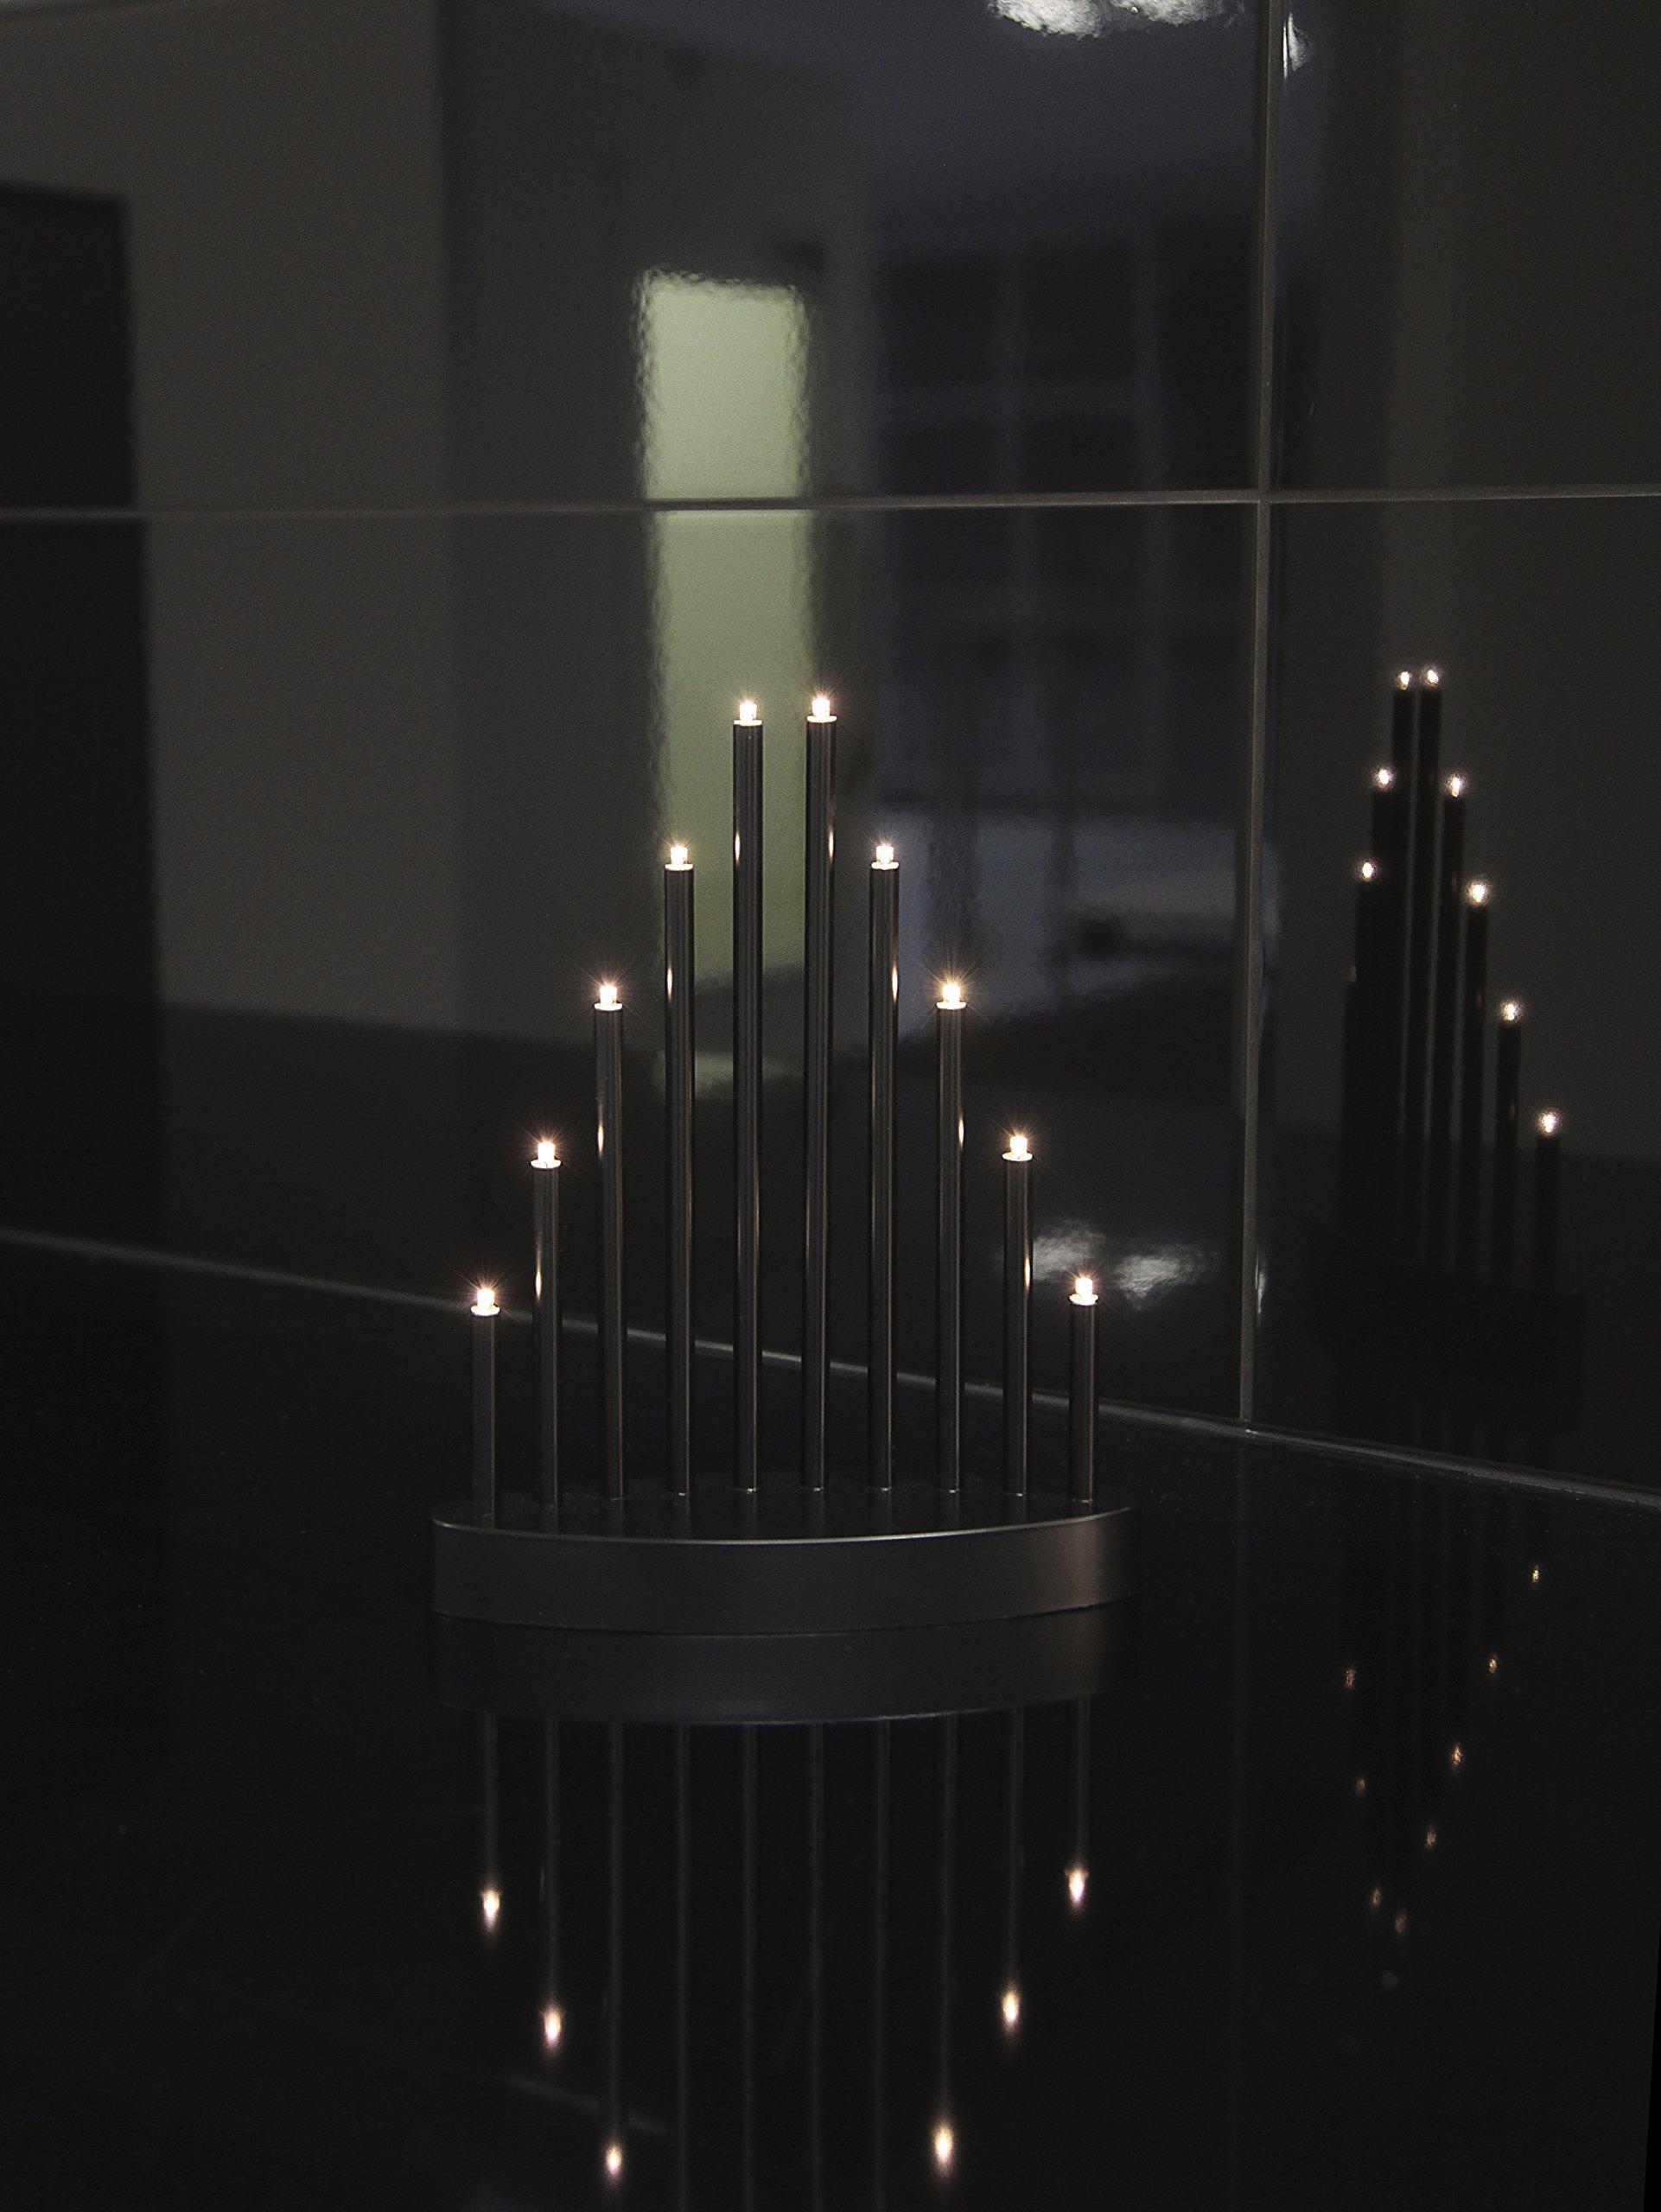 Star-LED-FensterleuchterTrix-Battery-Material-Kunststoff-10-flammig-Timer-Vierfarb-Karton-25-x-20-cm-schwarz-192-14